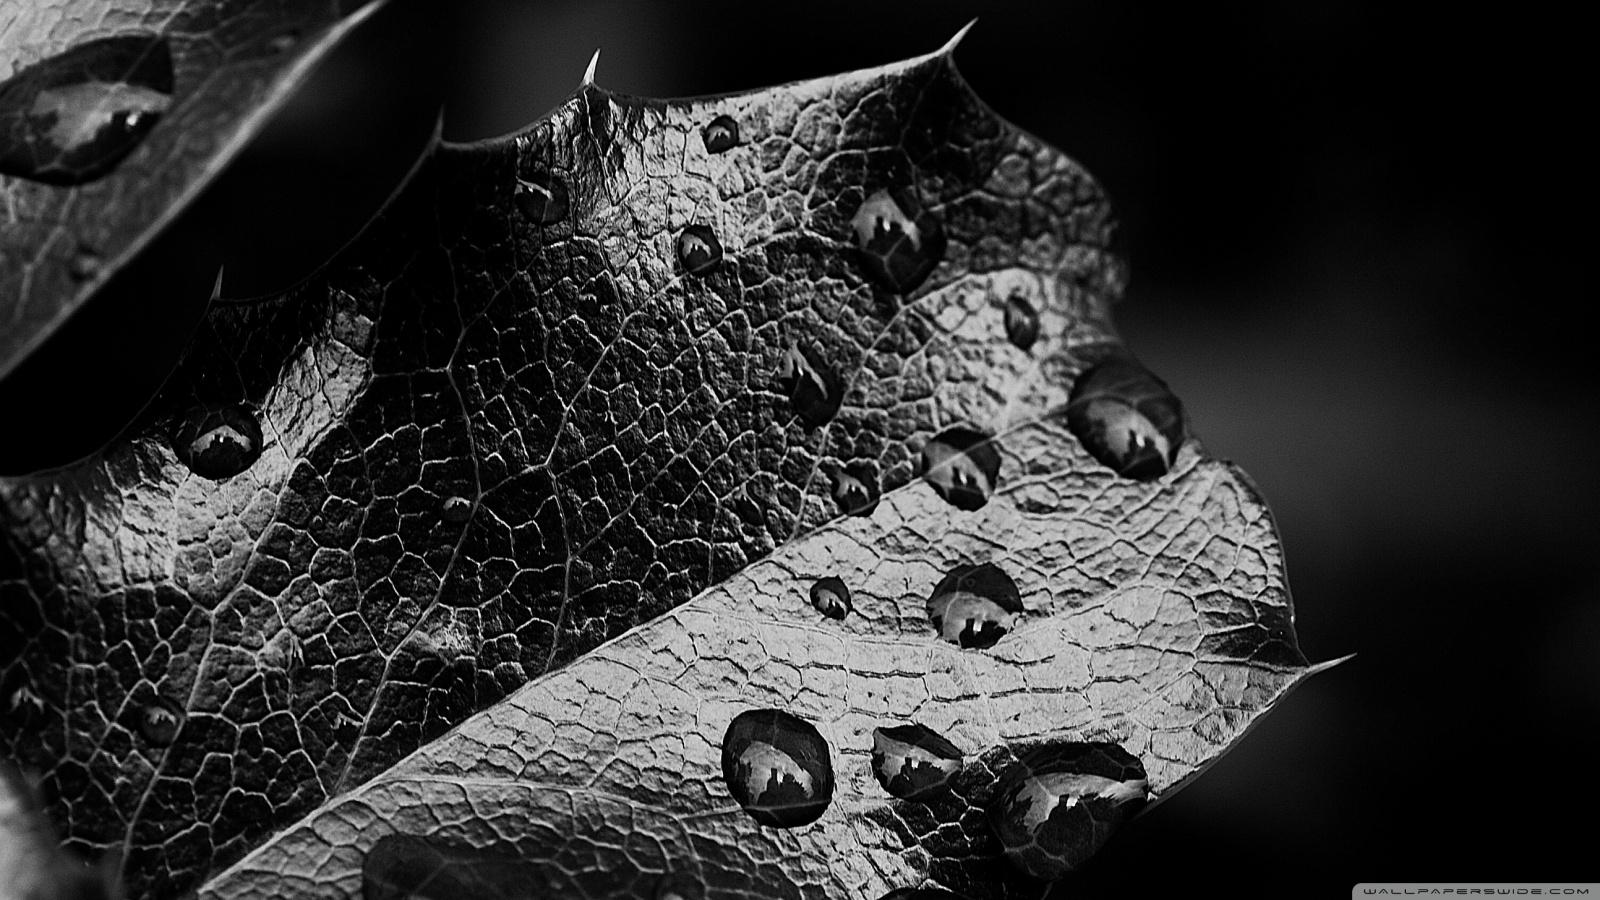 Beautiful Leaf Hd Wallpaper Leaf Macro Black And White 4k Hd Desktop Wallpaper For 4k